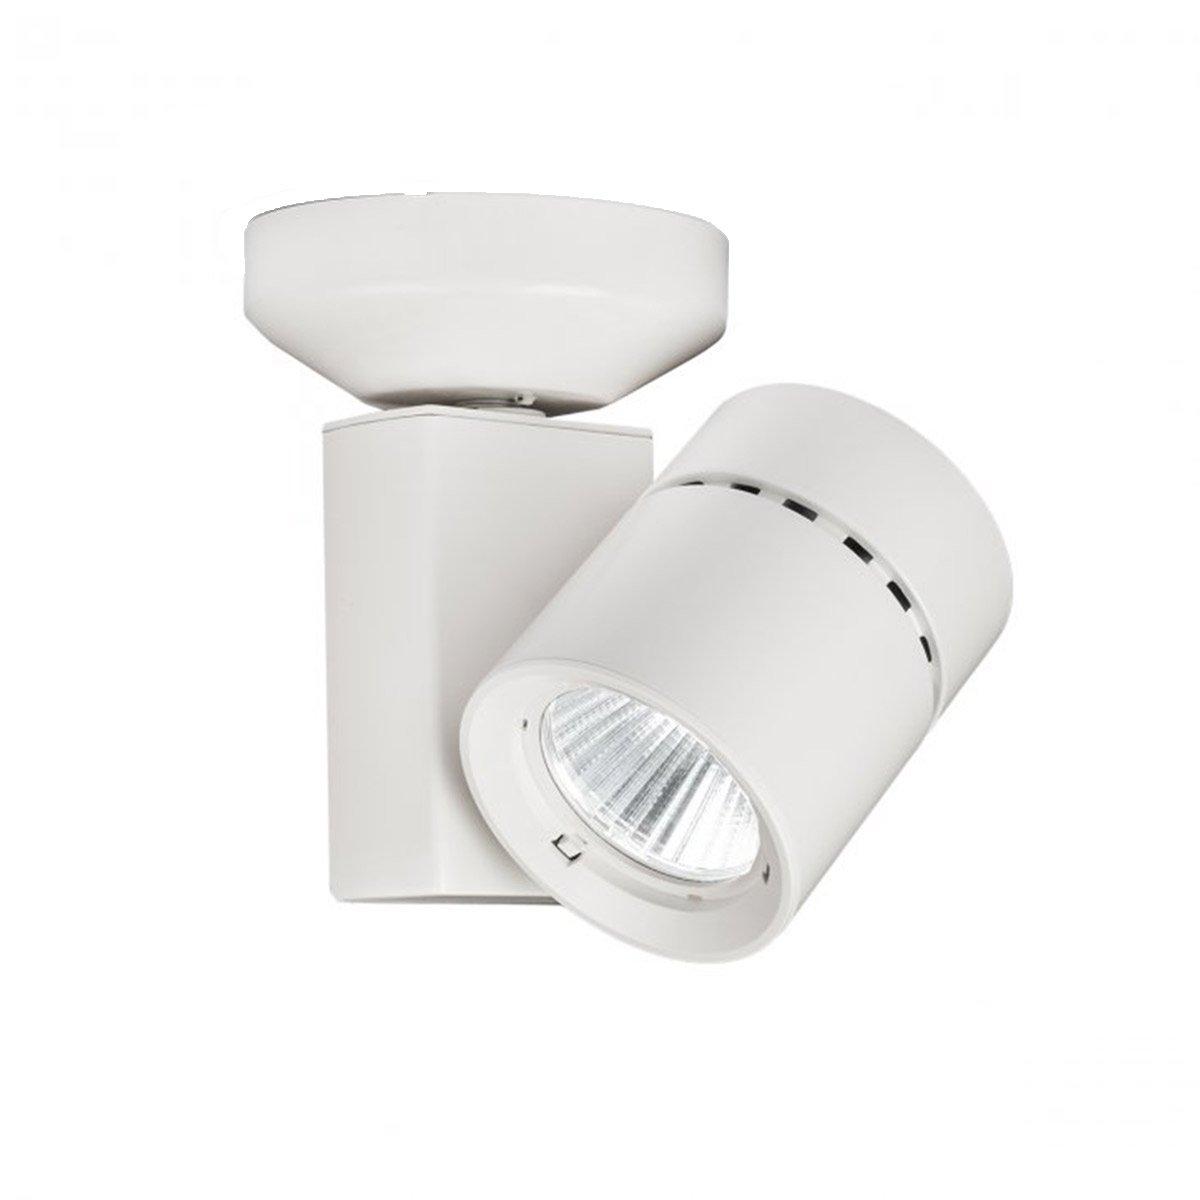 WAC Lighting MO-1023N-835-WT 1023 Exterminator II LED Energy Star Monopoint in White Finish Narrow Beam, 3500K